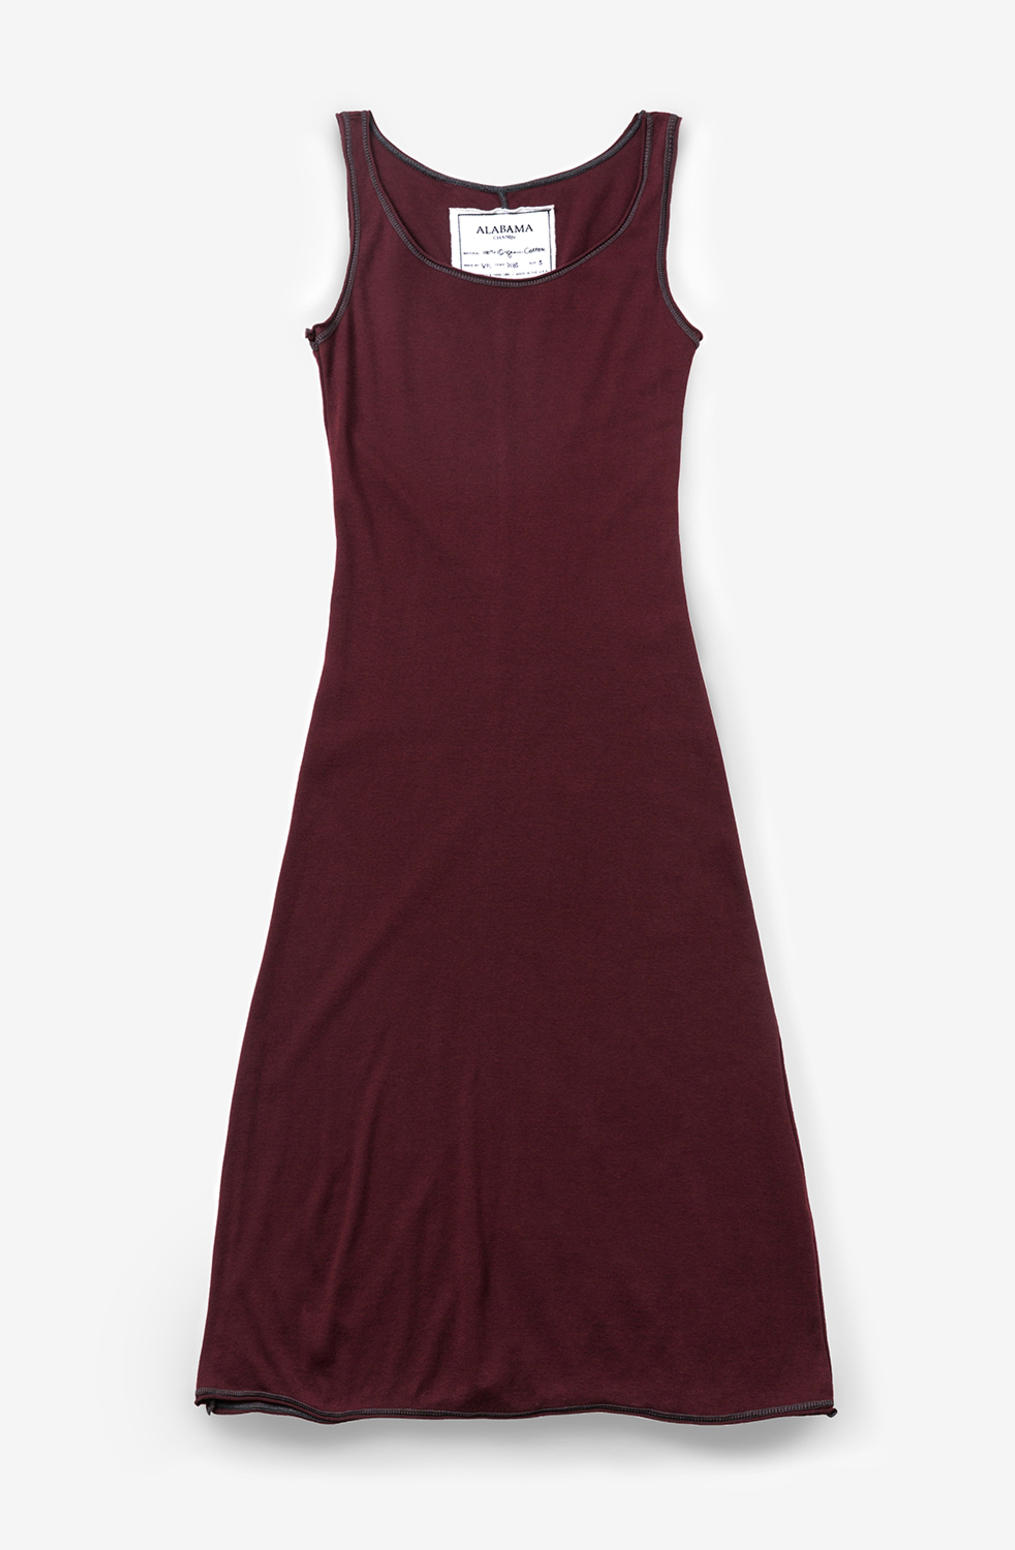 Alabama chanin womens layering slip dress